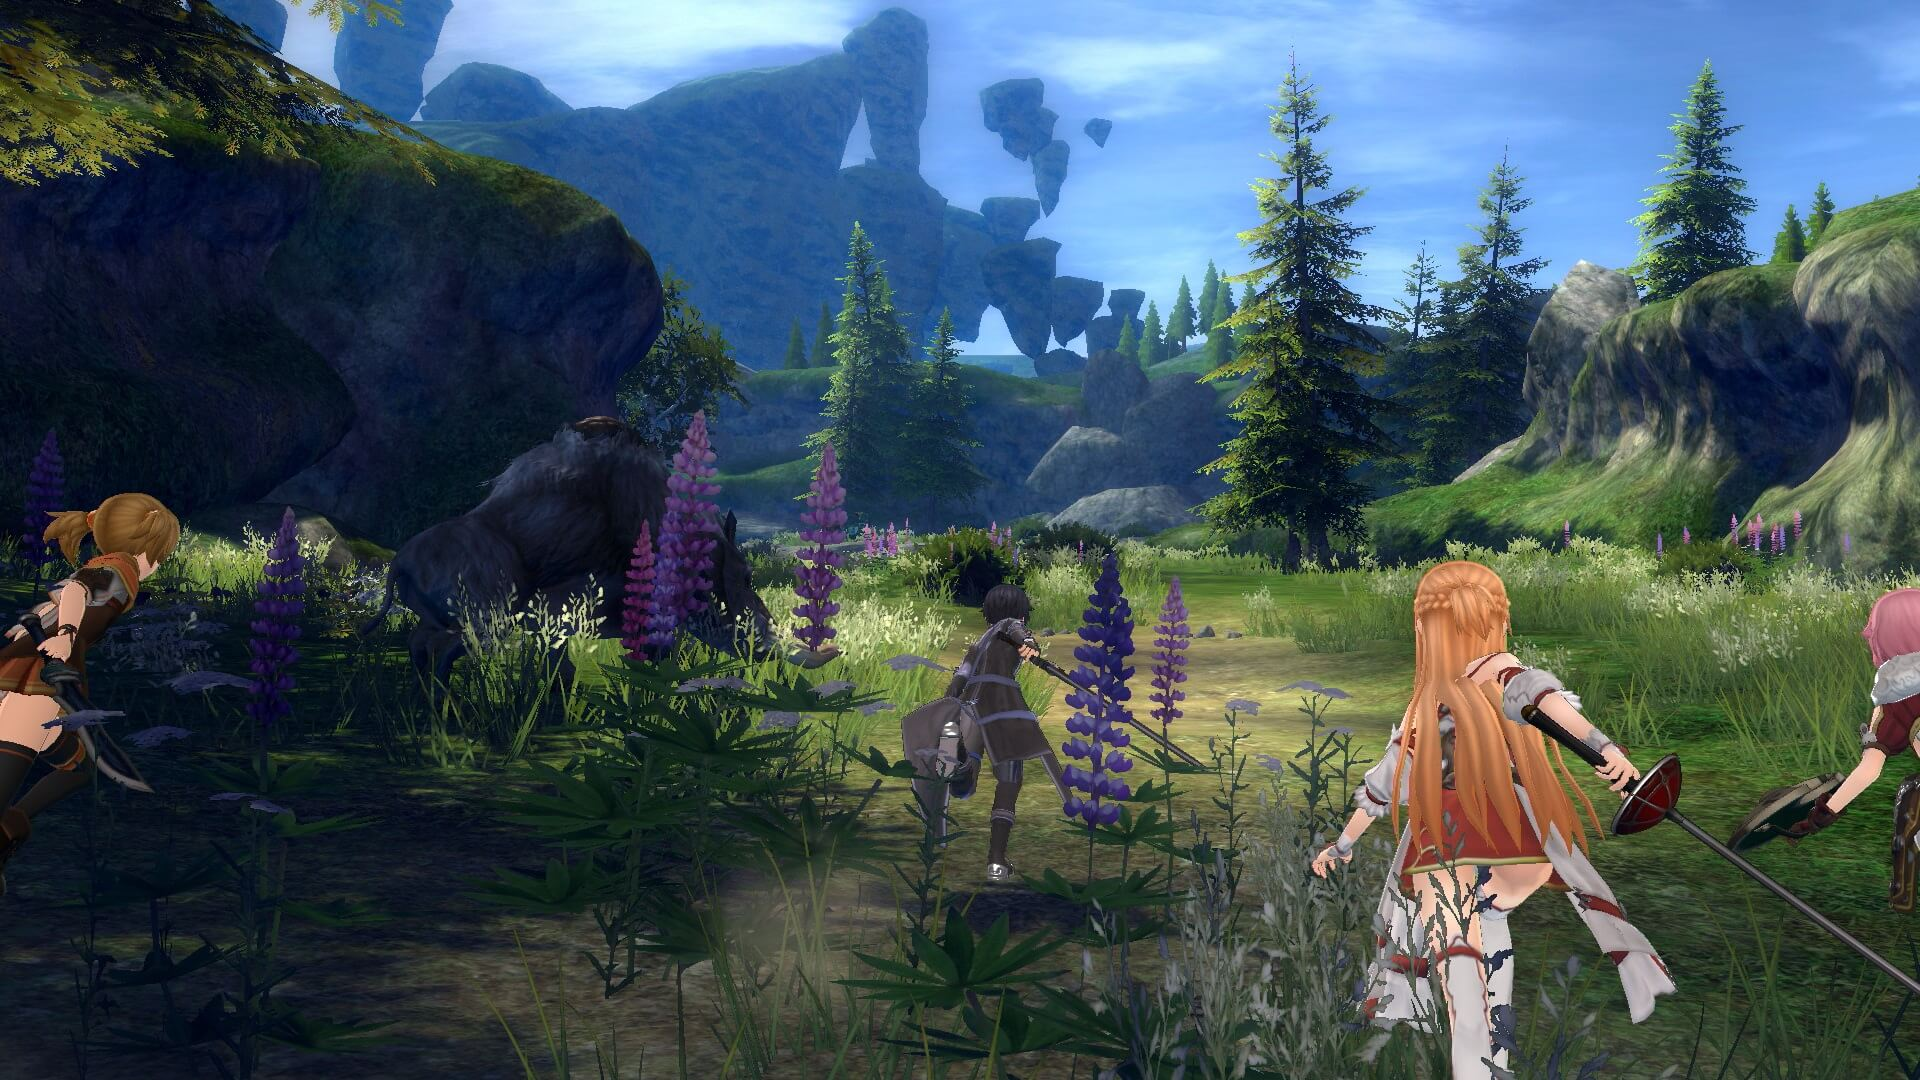 descargar Sword Art Online Hollow Realization para PC gratis 3